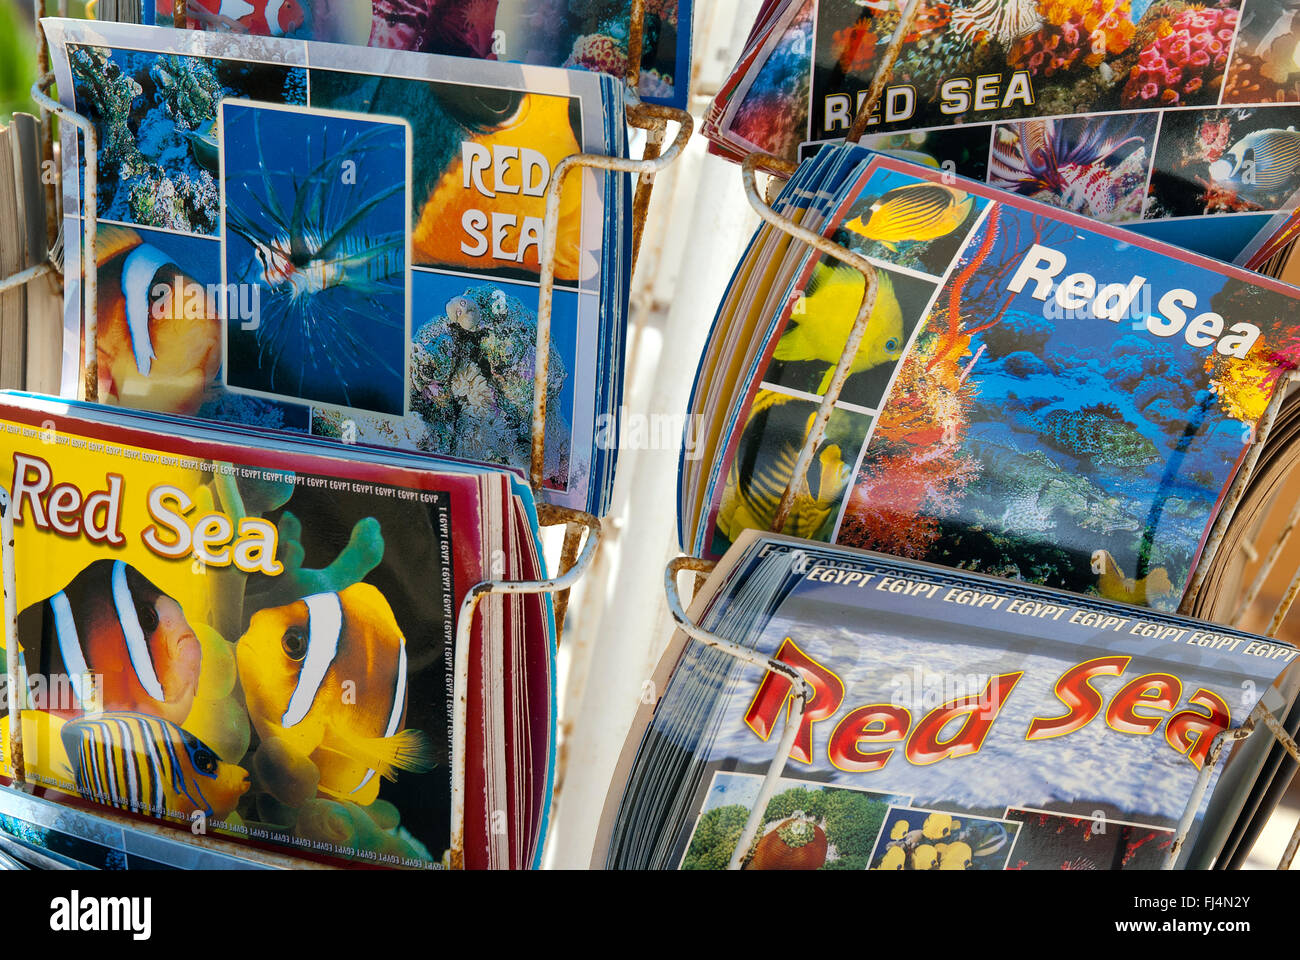 Postcards, Red Sea, Egypt - Stock Image